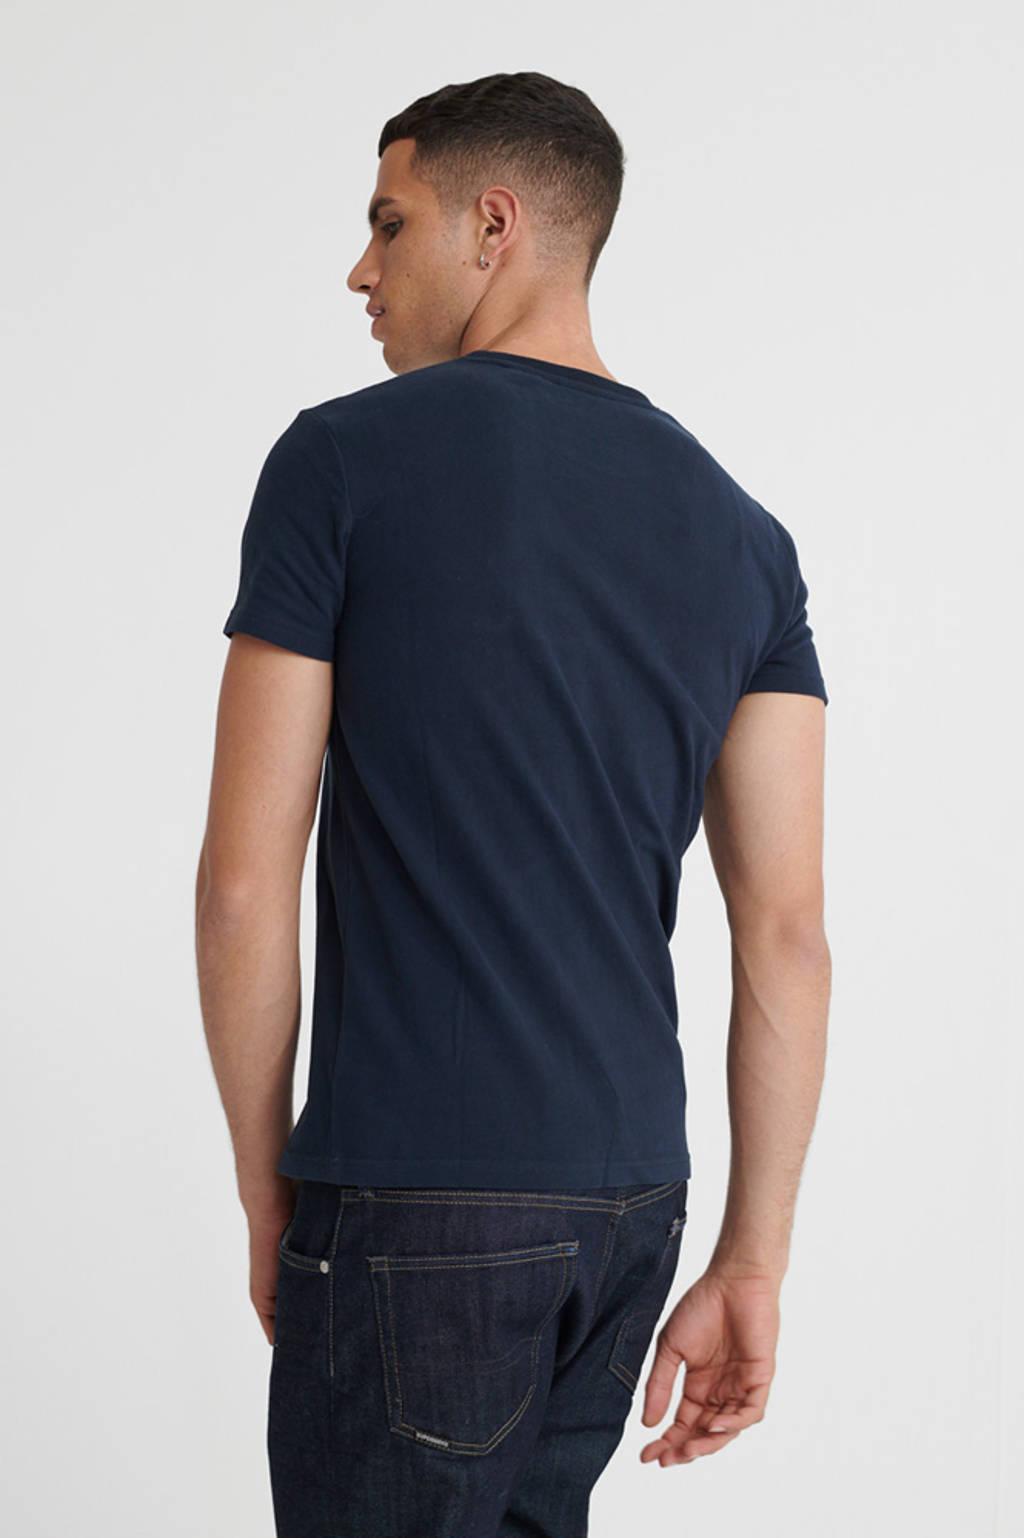 Superdry T-shirt met printopdruk donkerblauw, Donkerblauw